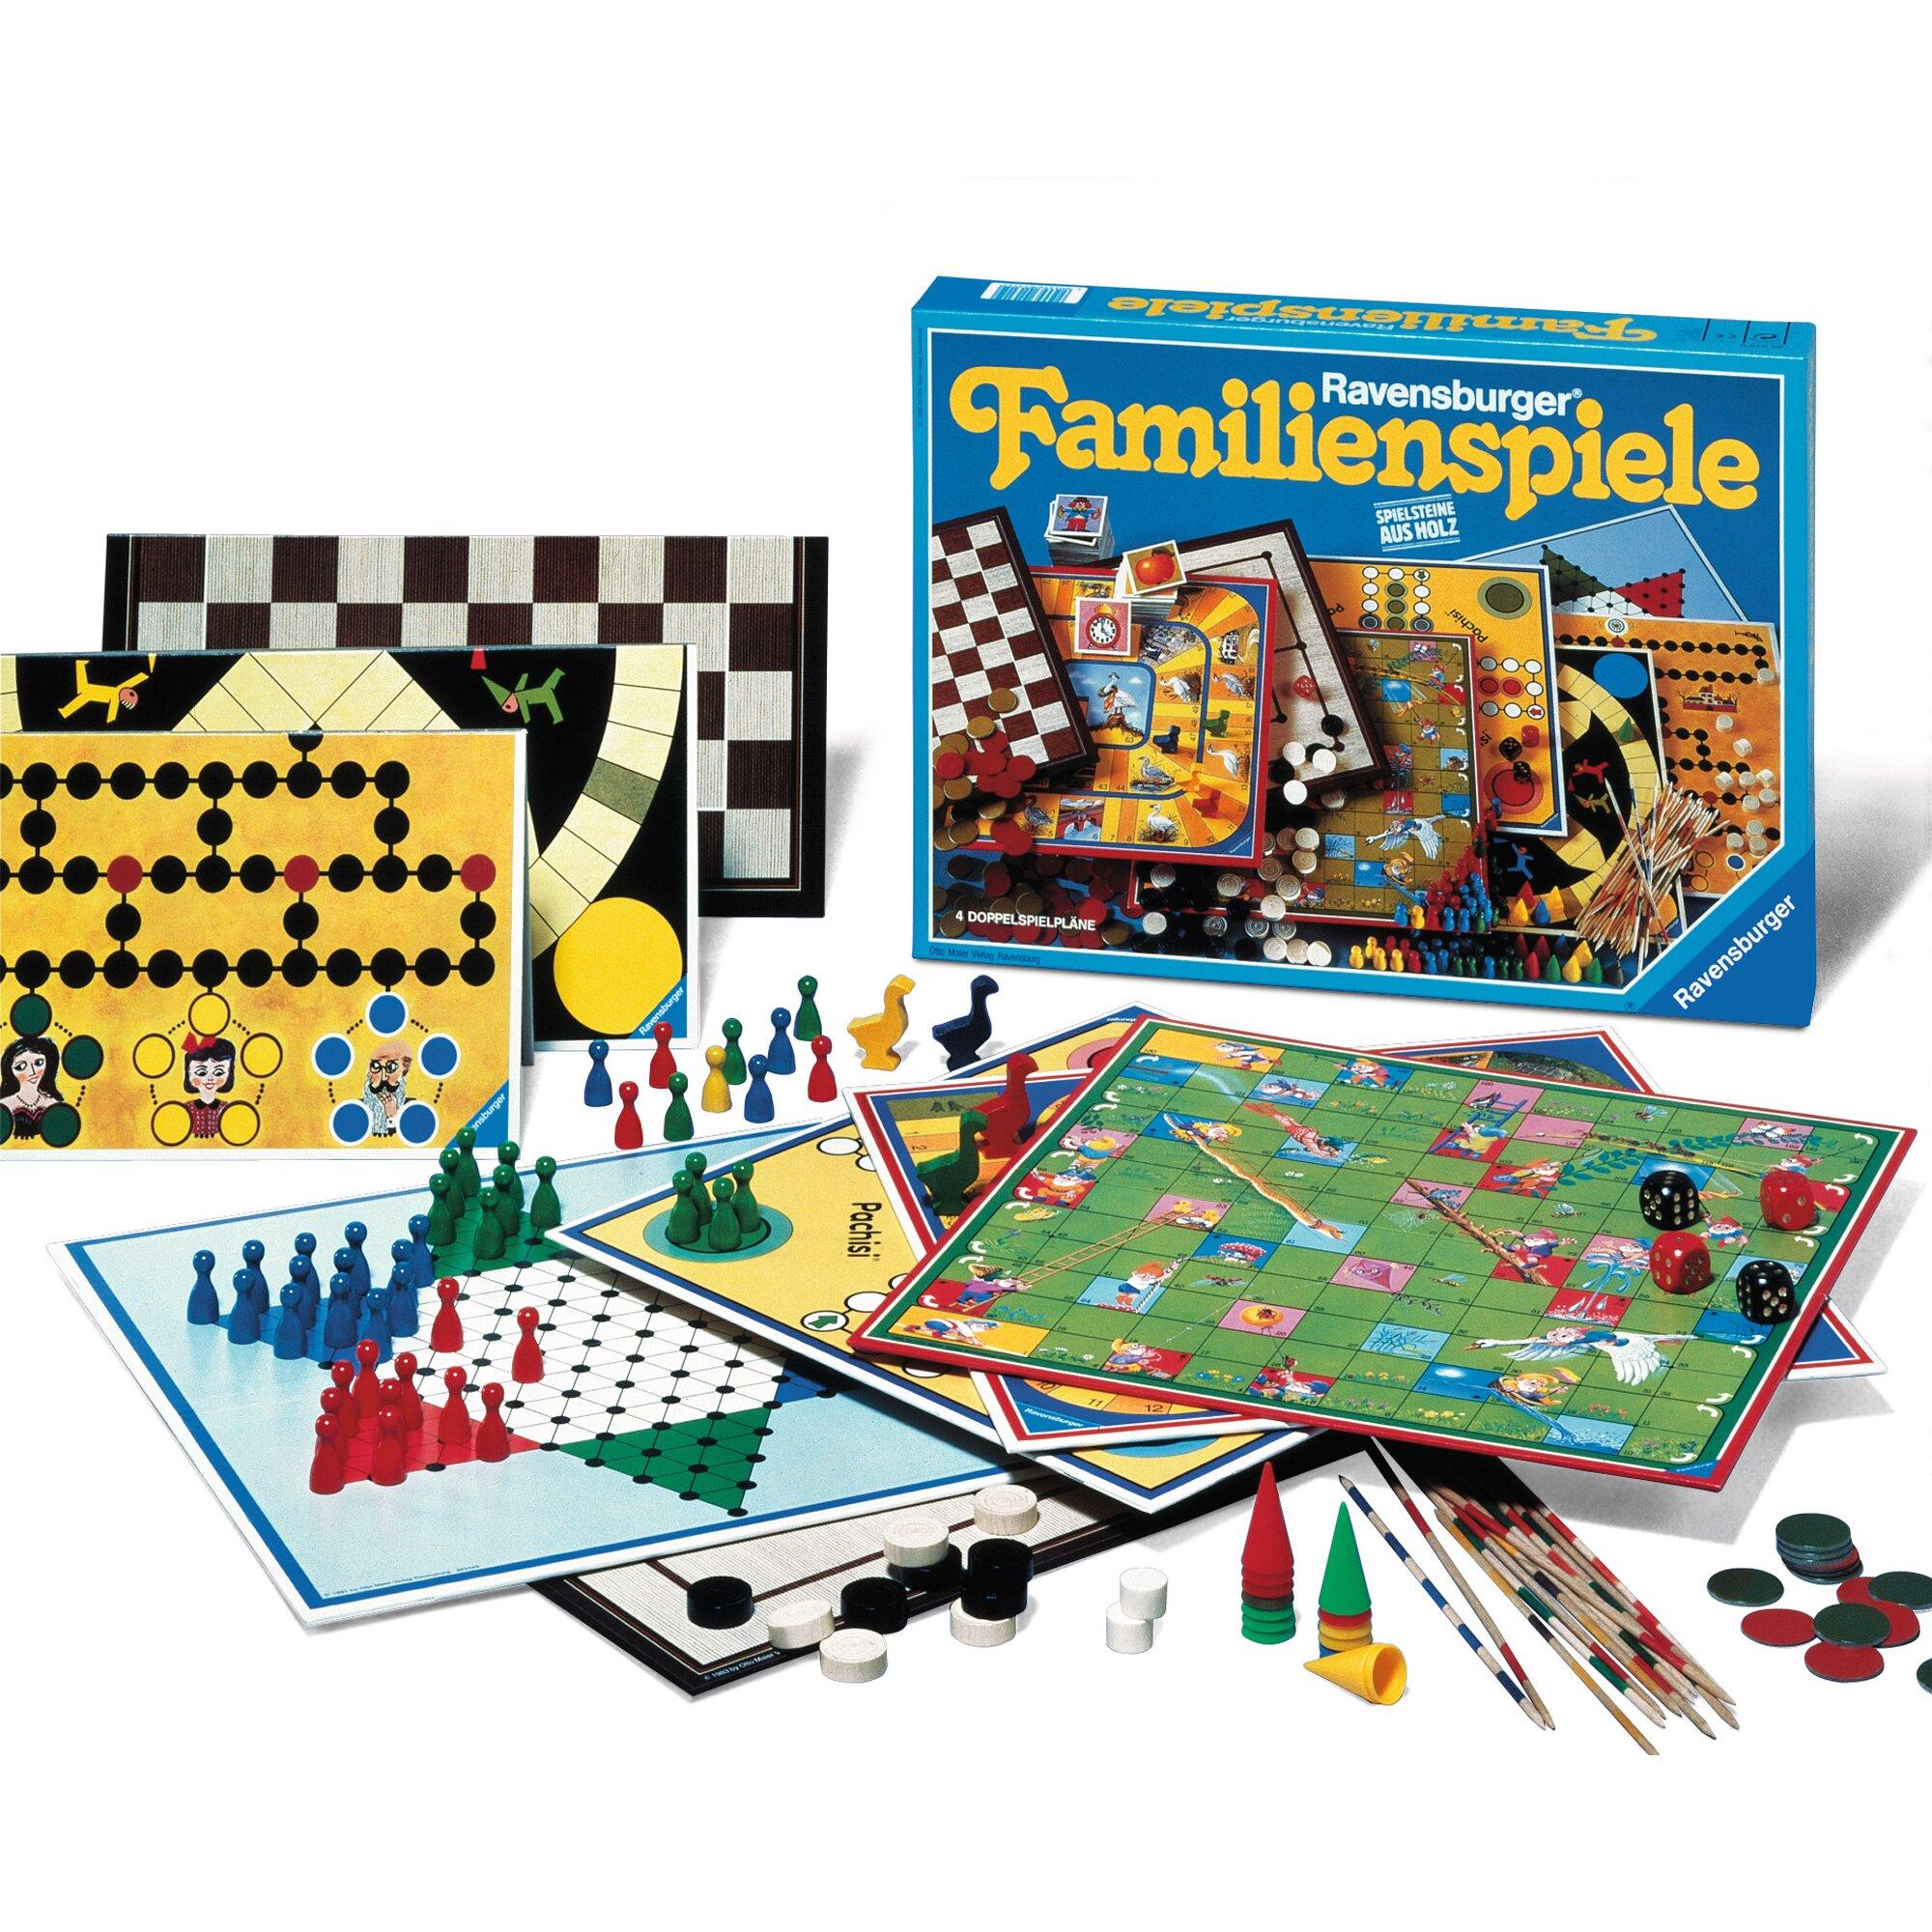 ravensburger-ravensburger-familienspiele-spielesammlung